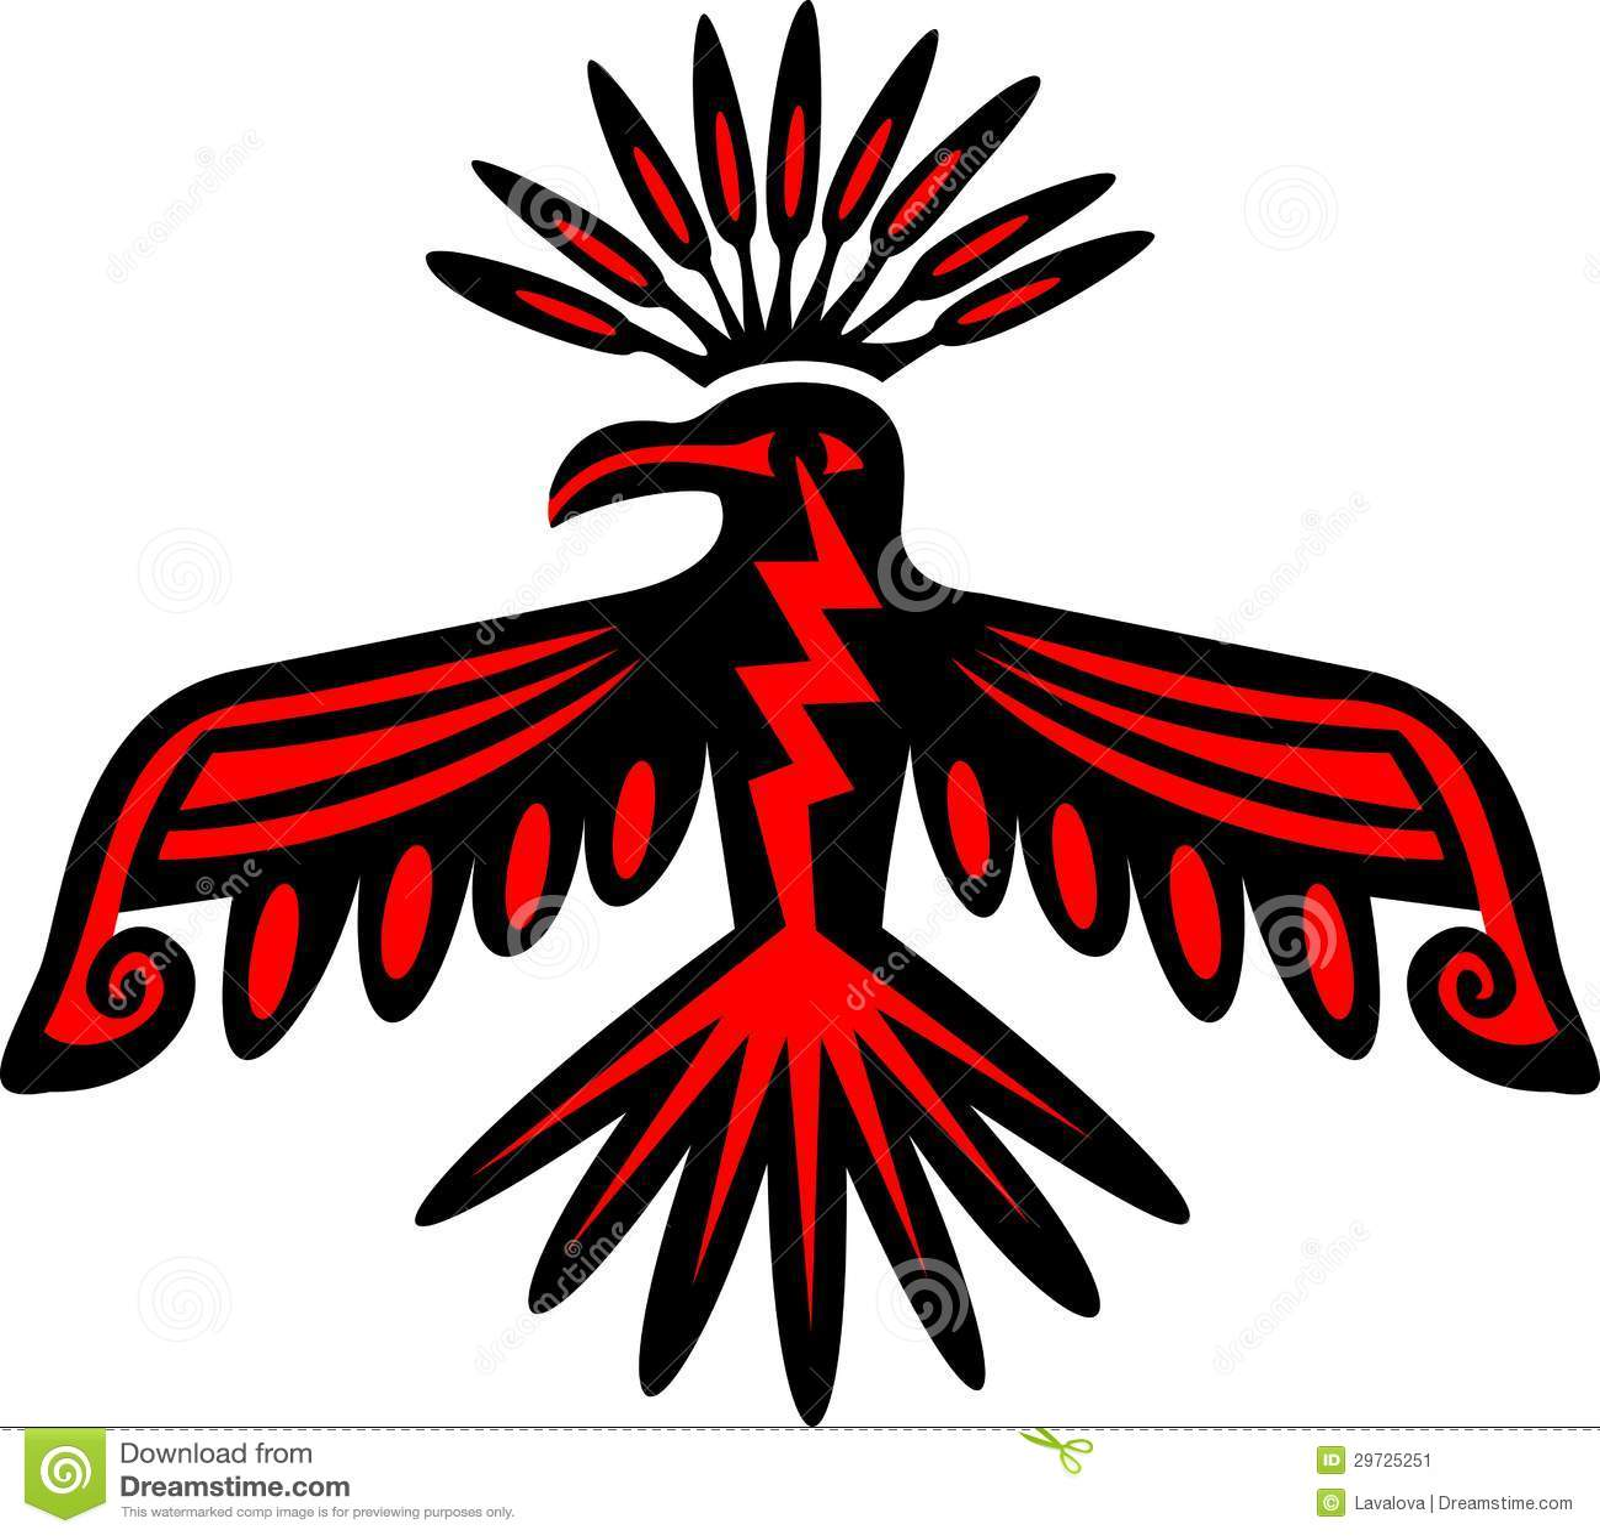 20 Cherokee Indian Tattoos  KOOL TATTOO IDEAS